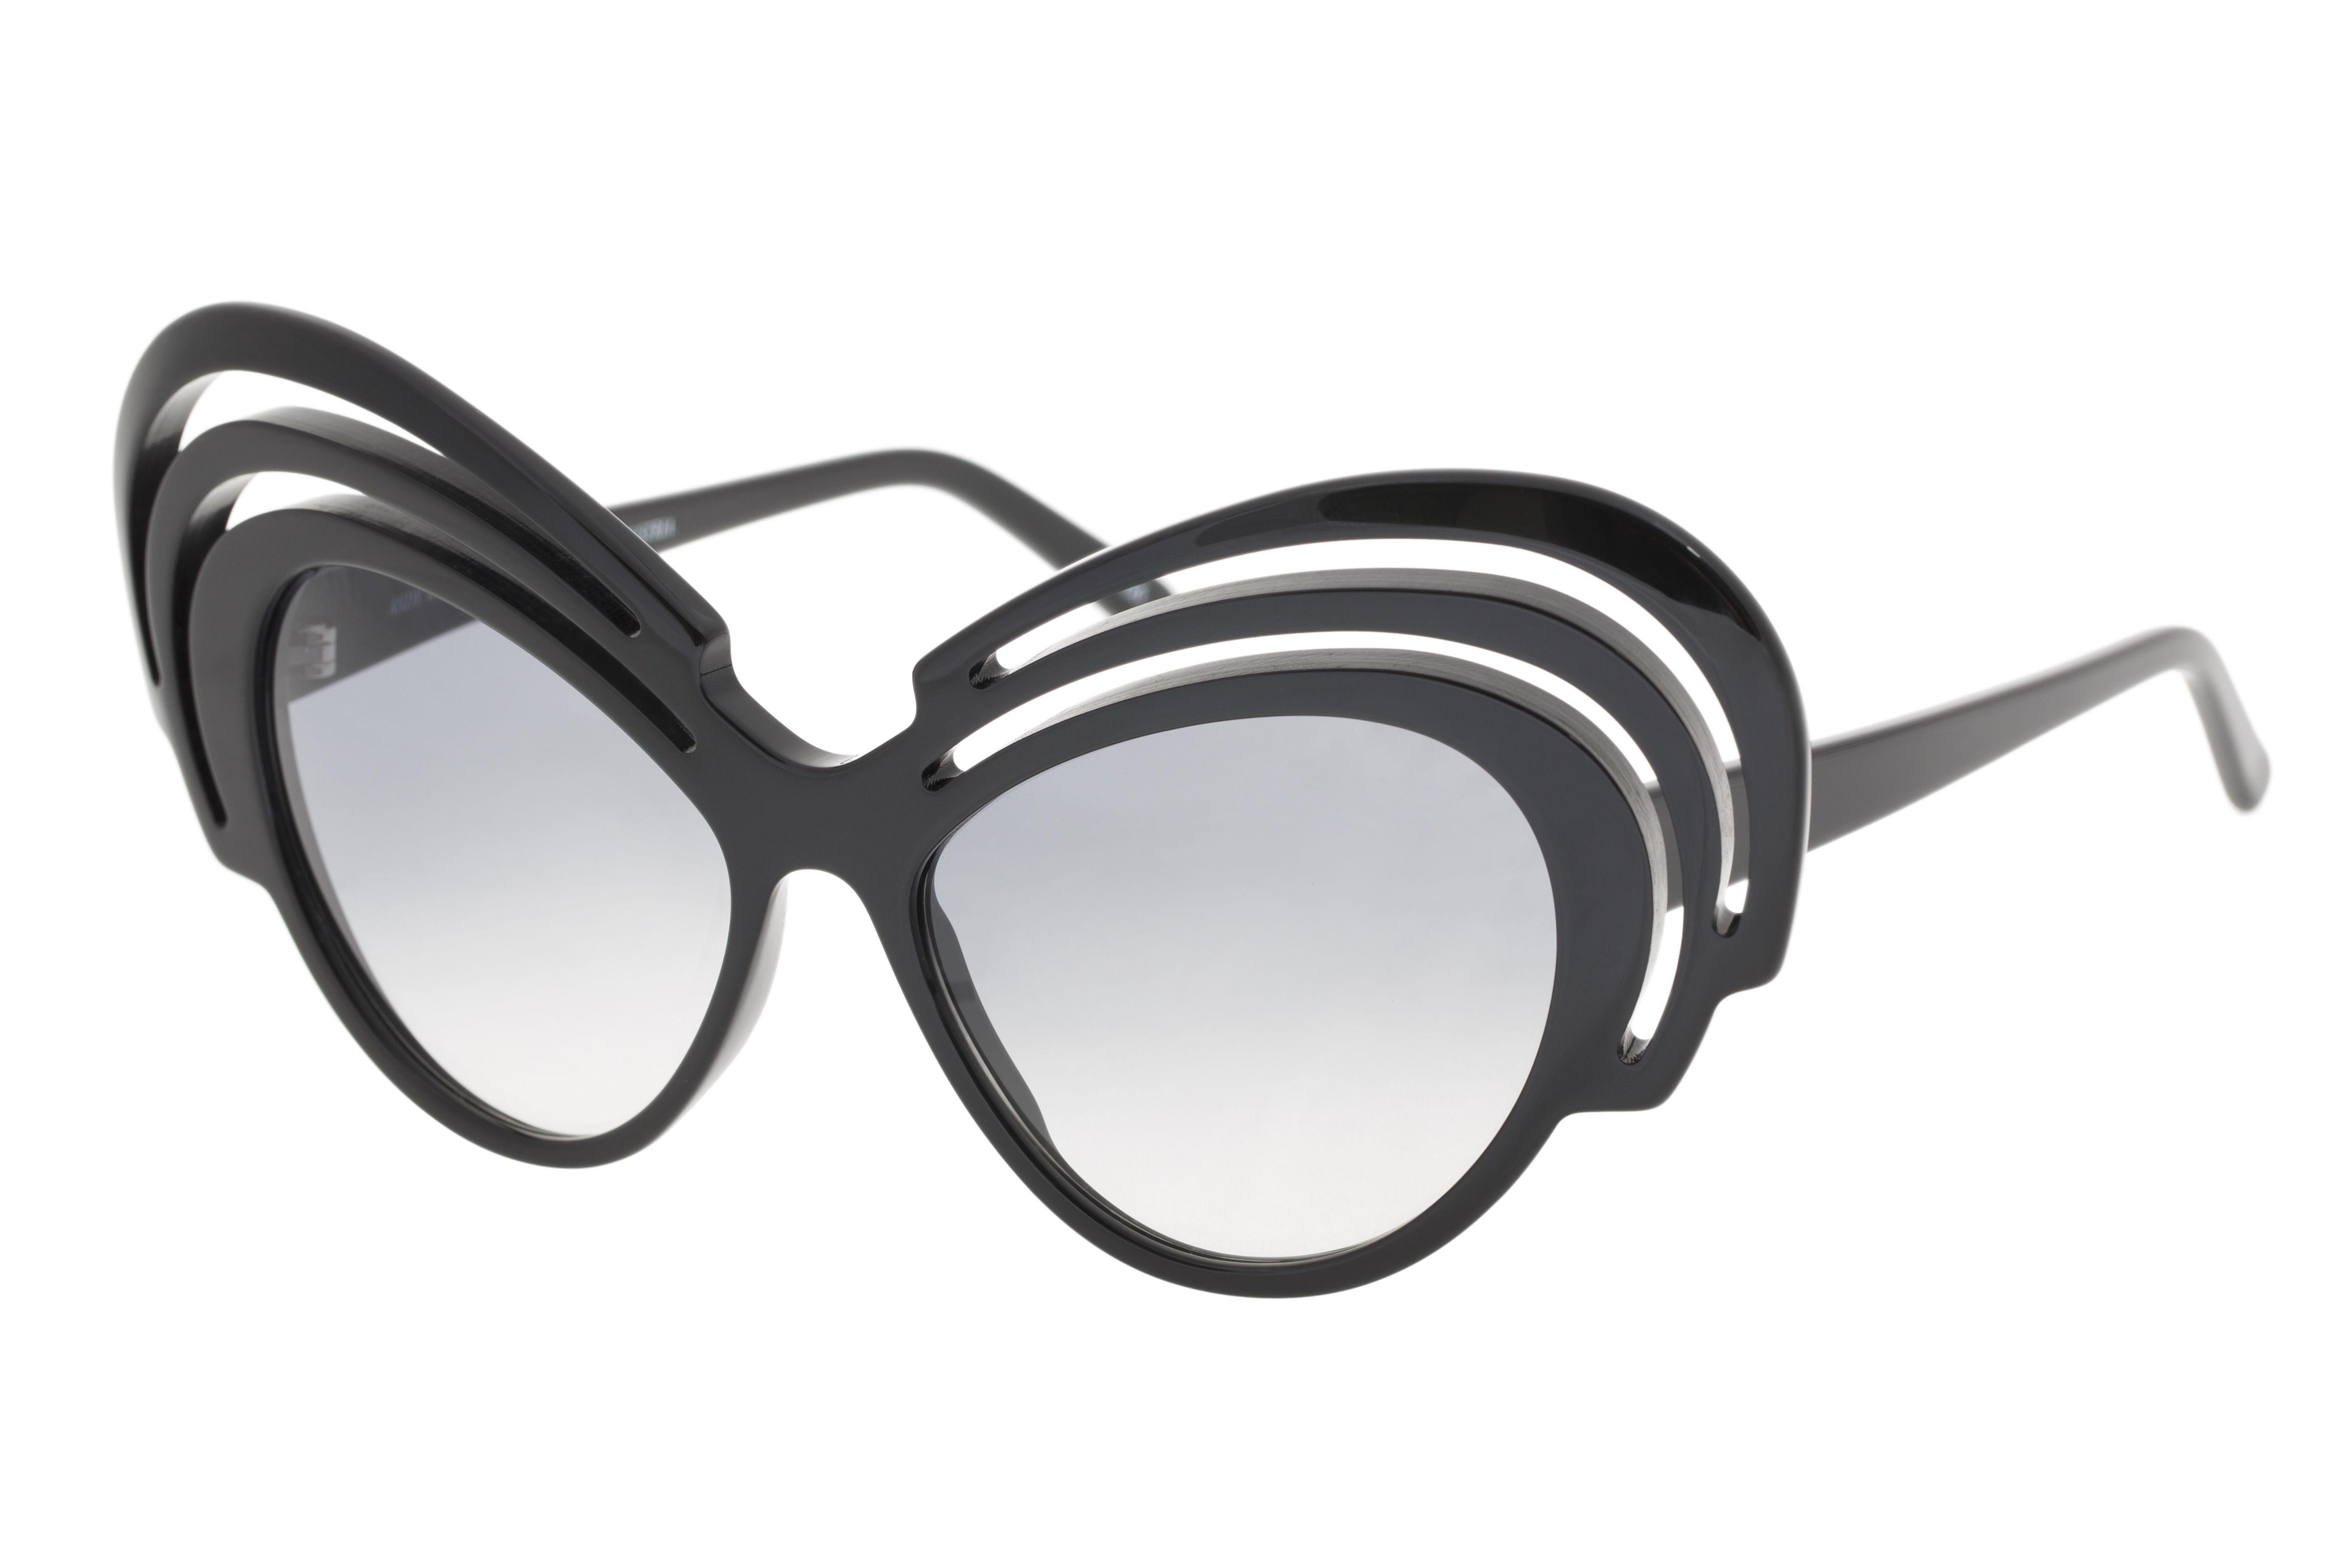 0f2e0adc3e89 AndyWolfEyewear - Kitty C col. a - CANDY CAN - Sunnies - Sunglasses ...